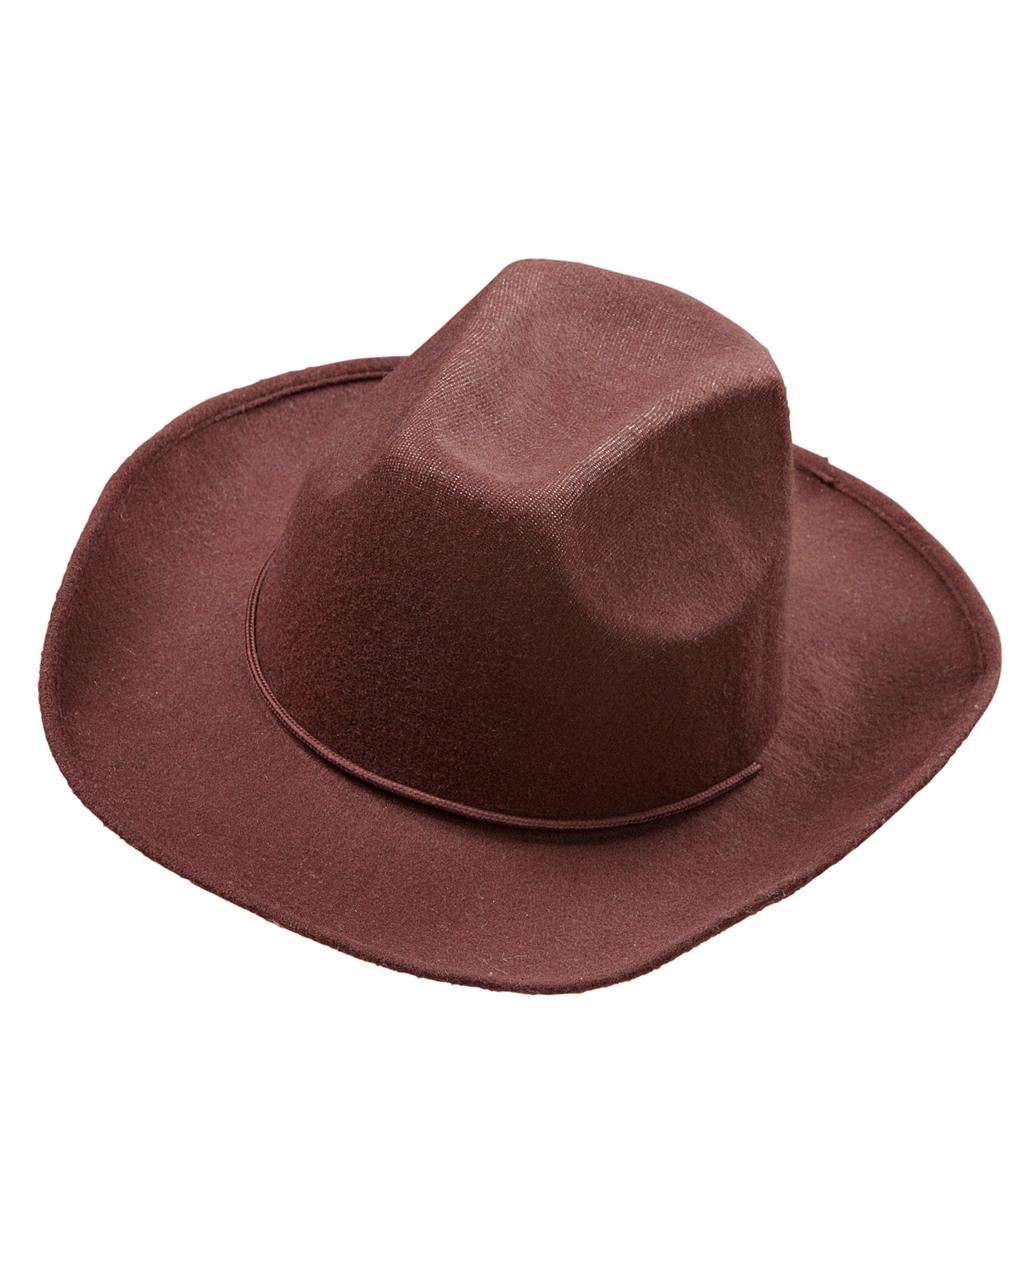 488c7cbb1ed Cowboy Felt Hat Brown